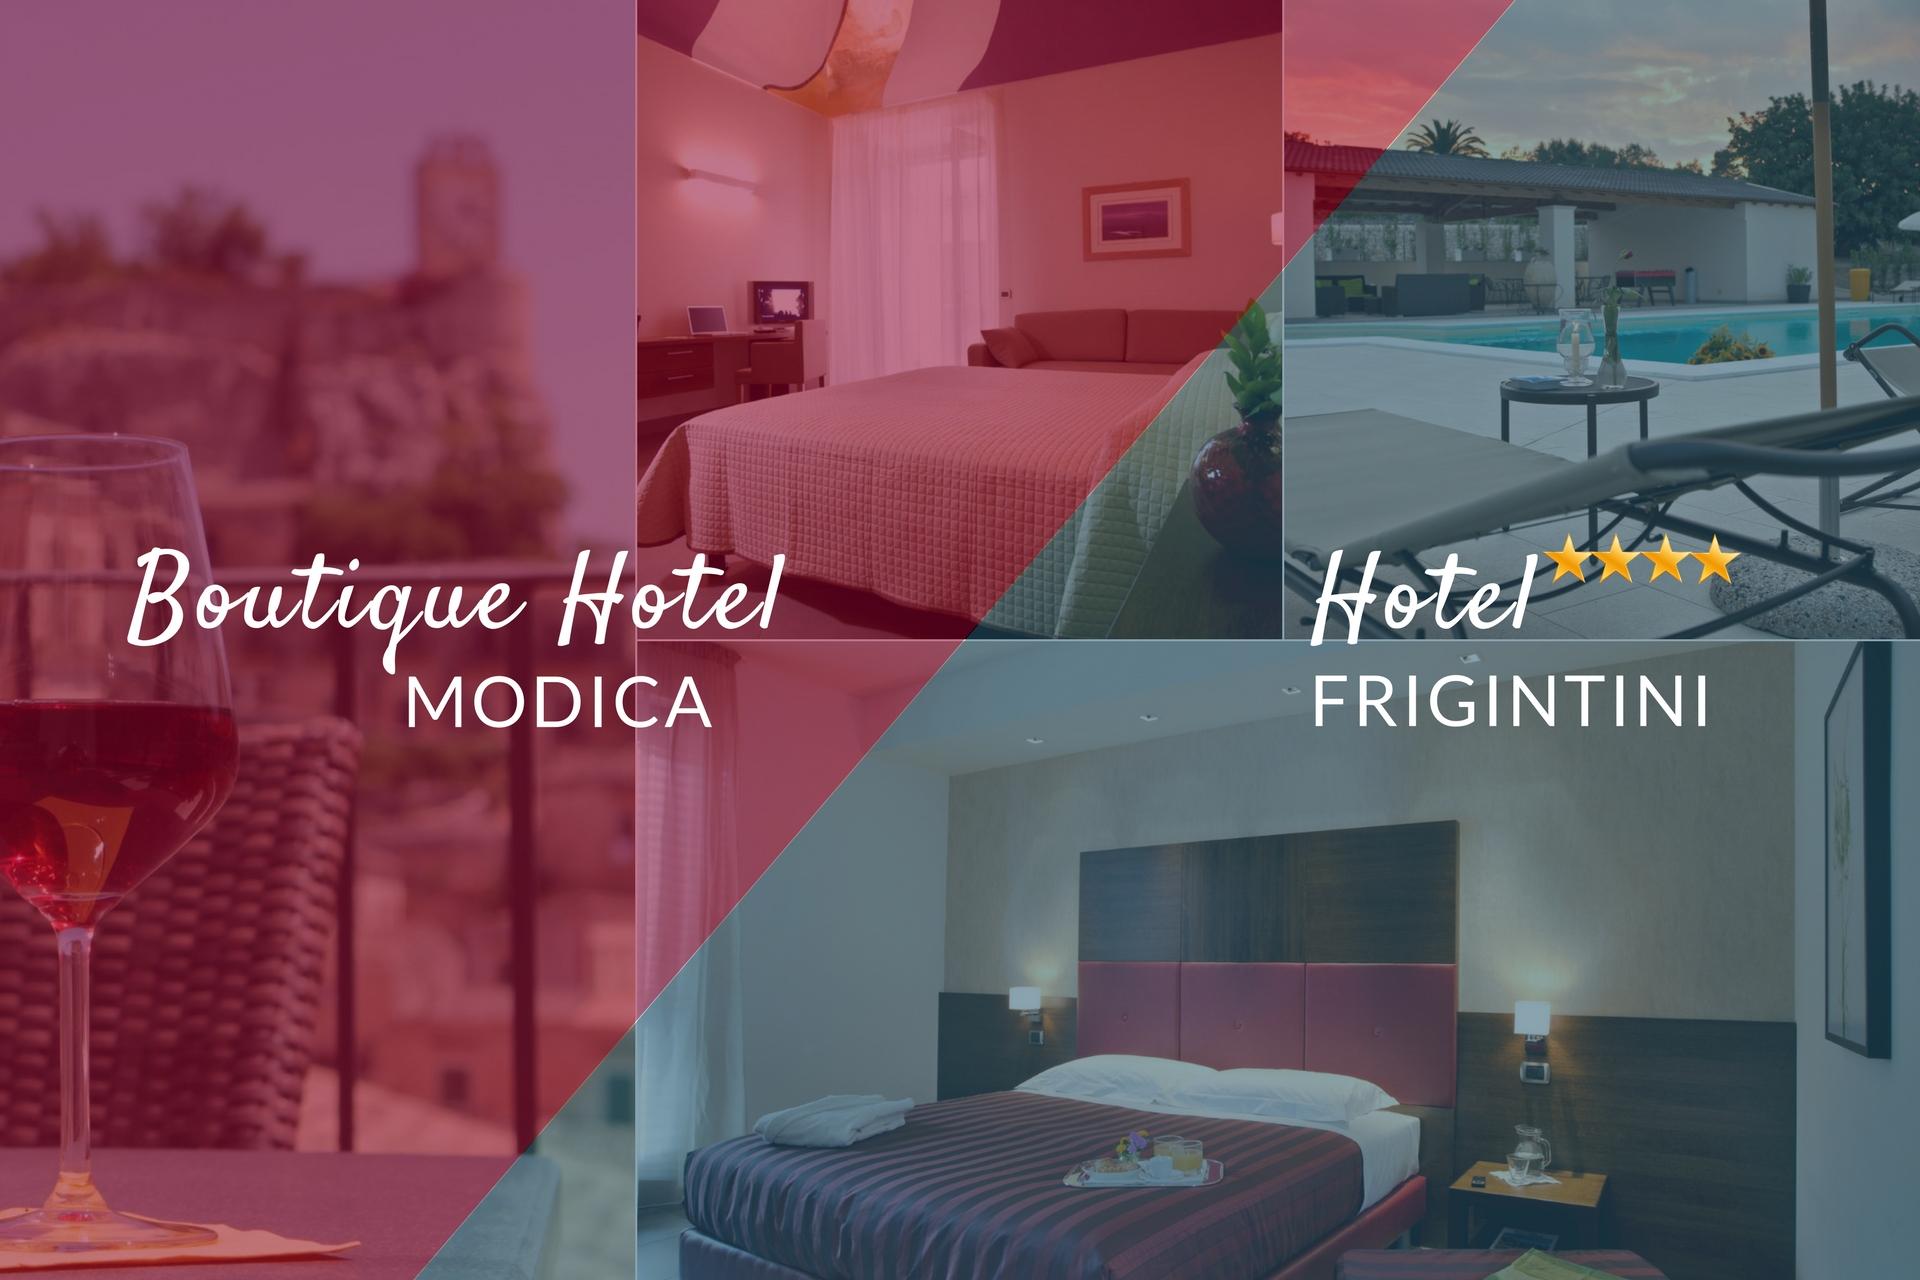 Le Magnolie Hotel | Hotel**** a Frigintini | Boutique Hotel a Modica